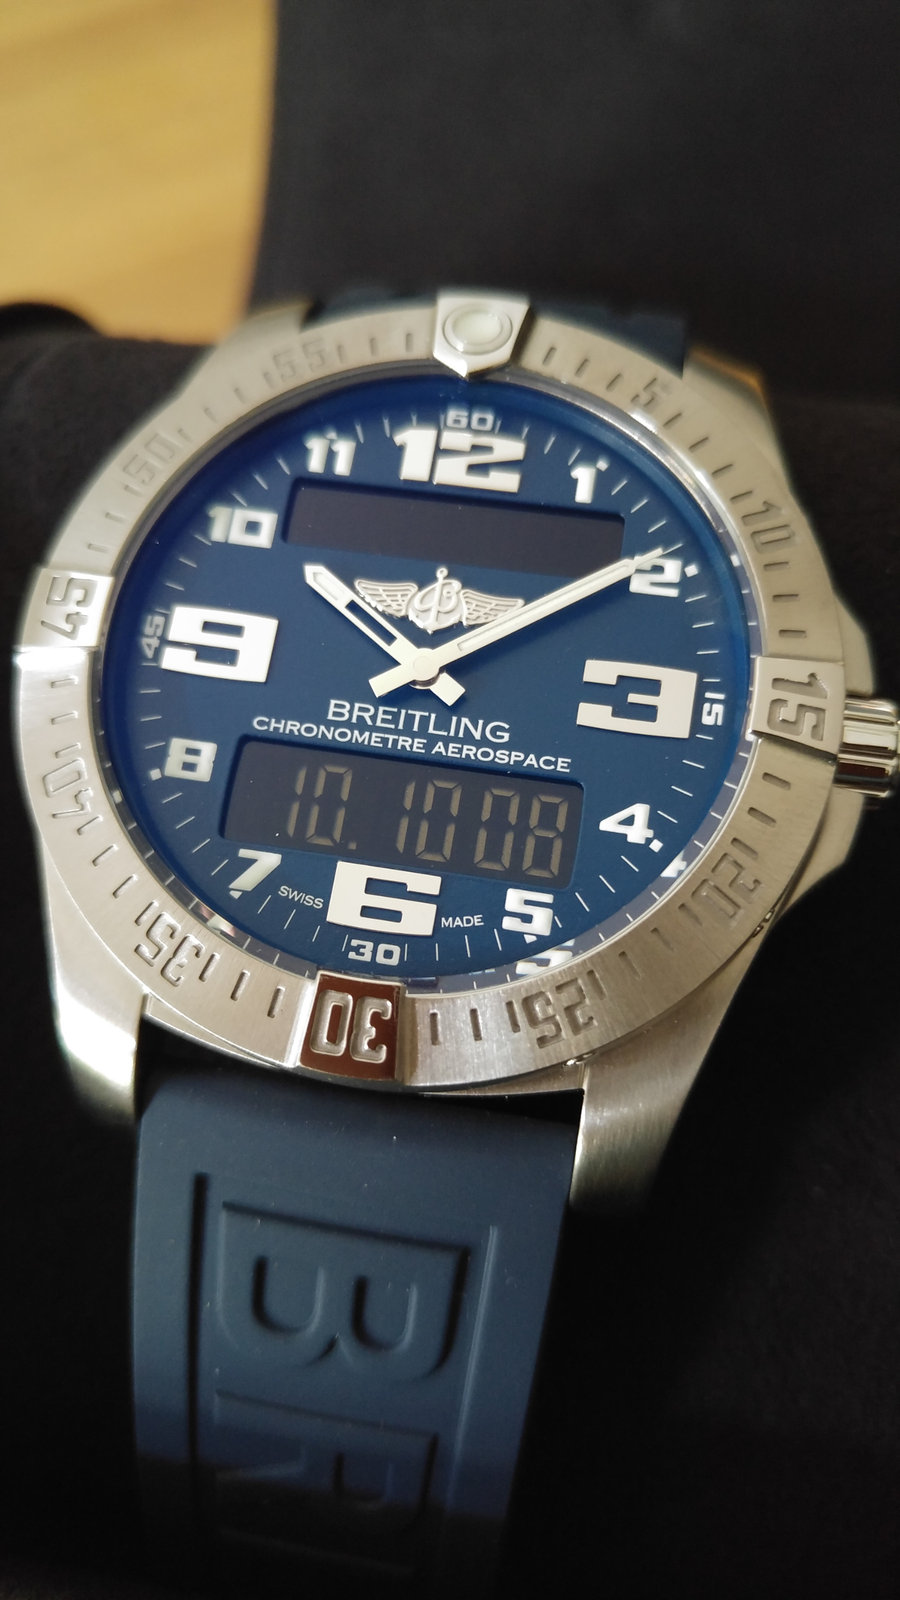 [Erledigt] Breitling Aerospace Evo E7936310.C869.158S